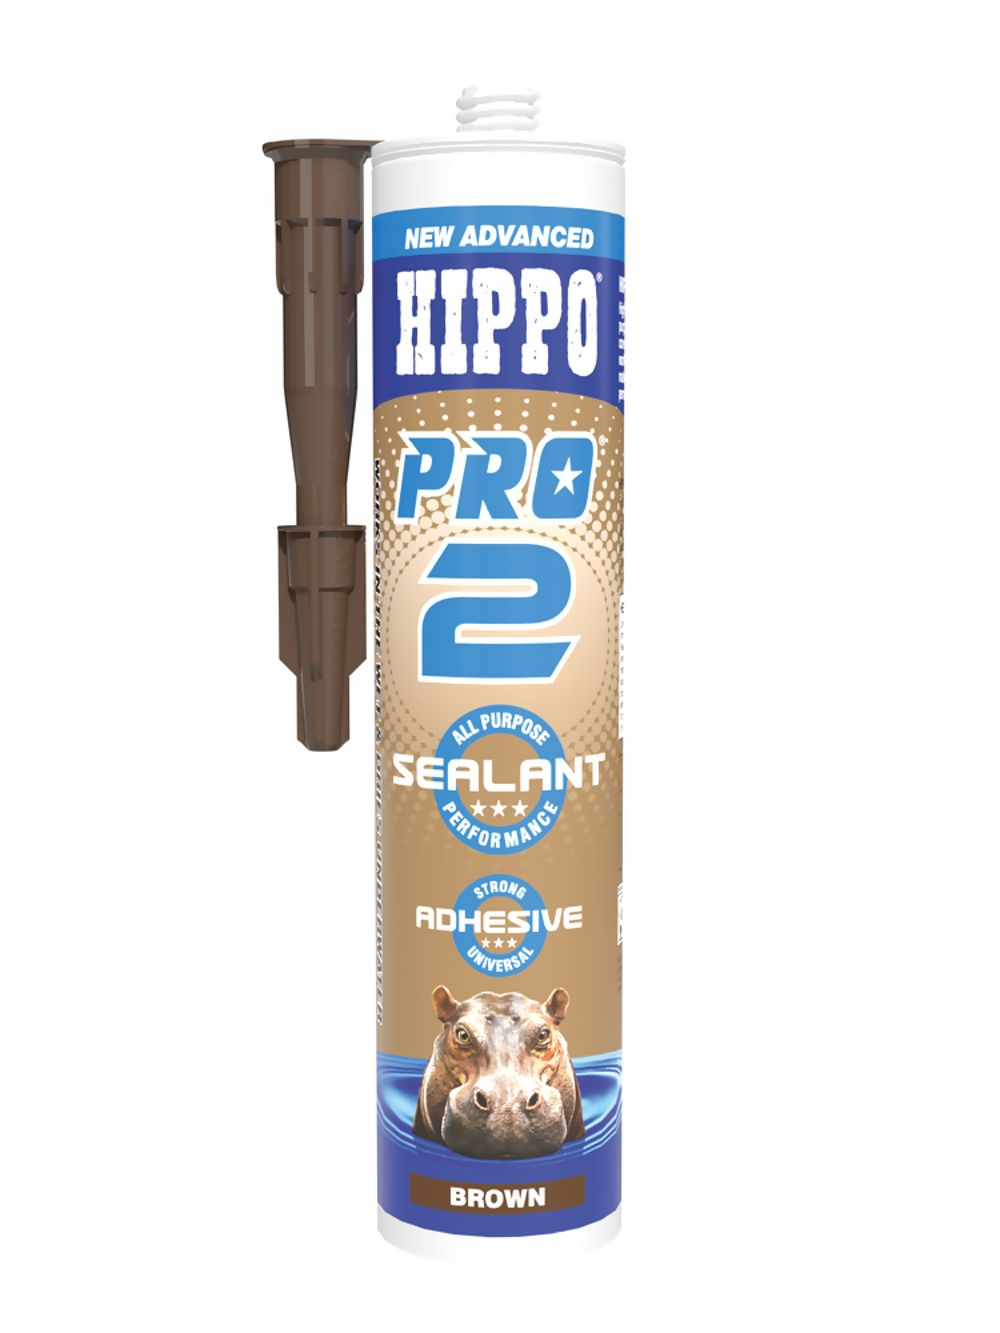 Hippo Pro 2 Sealant & Adhesive Brown 310ml Ref H18543